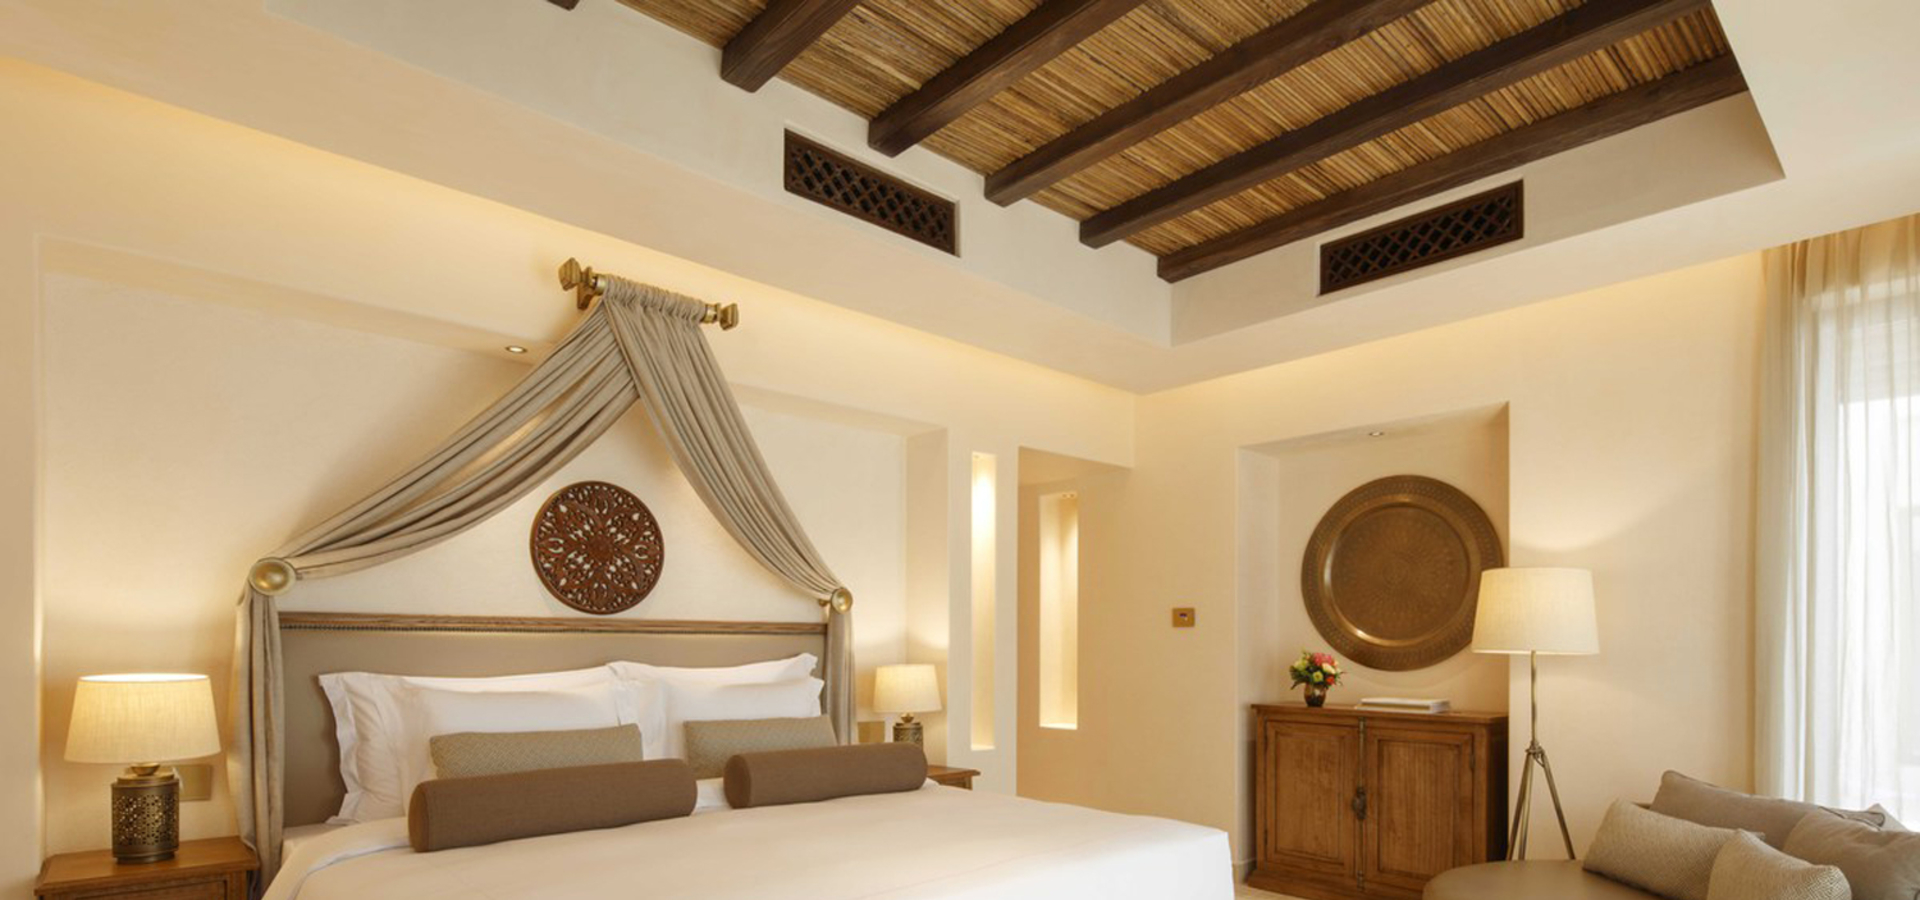 Al Wathba Desert Resort & Spa opens for business in Abu Dhabi